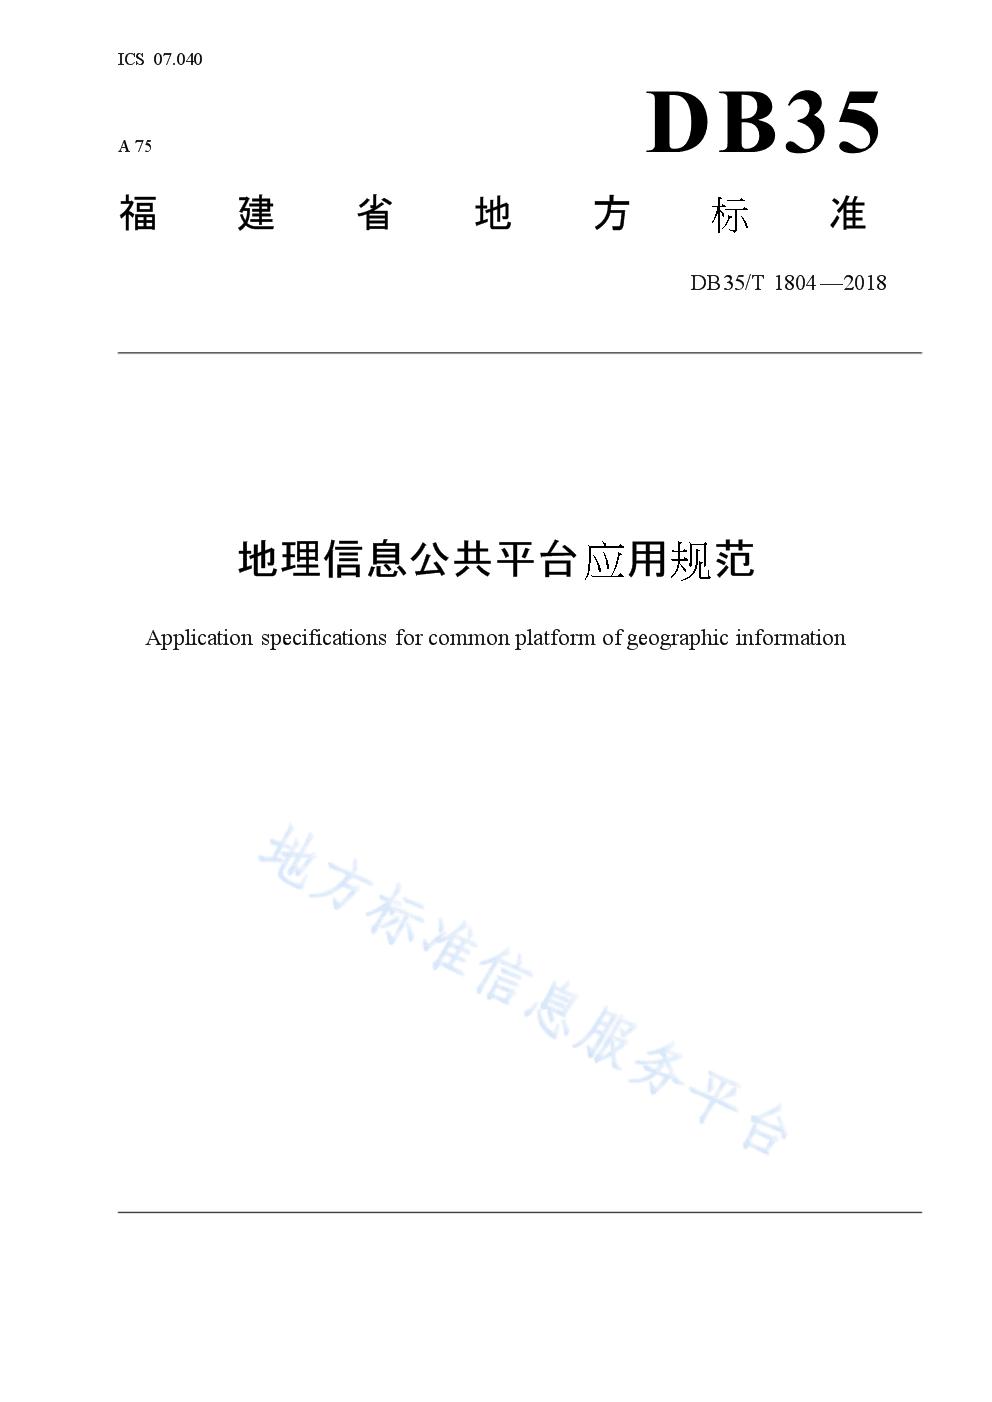 DB35_T 1804-2018地理信息公共平台应用规范.docx